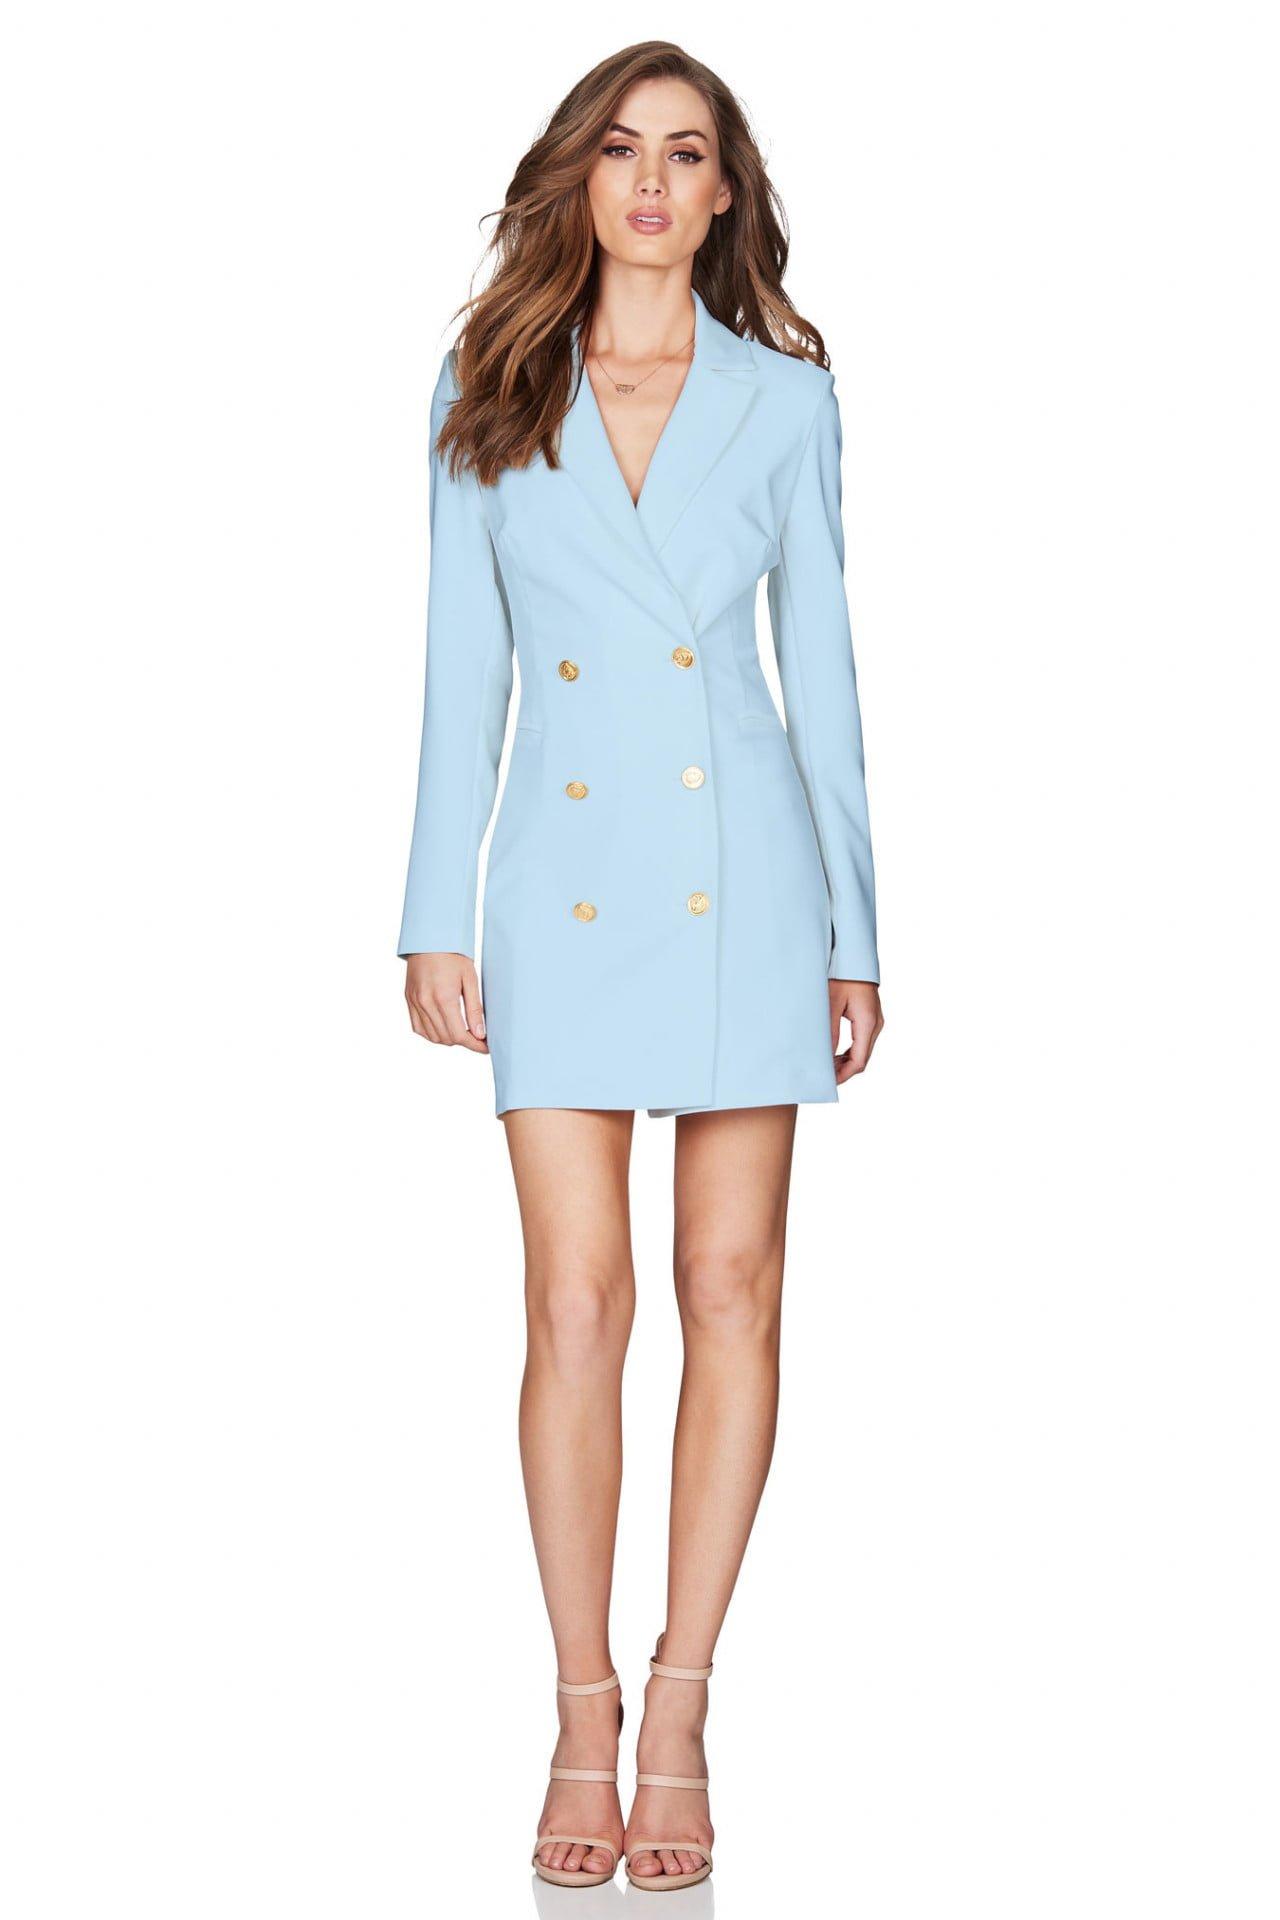 Nookie Milano Blazer Dress Long-Sleeve, Mini, V-Neck Blue